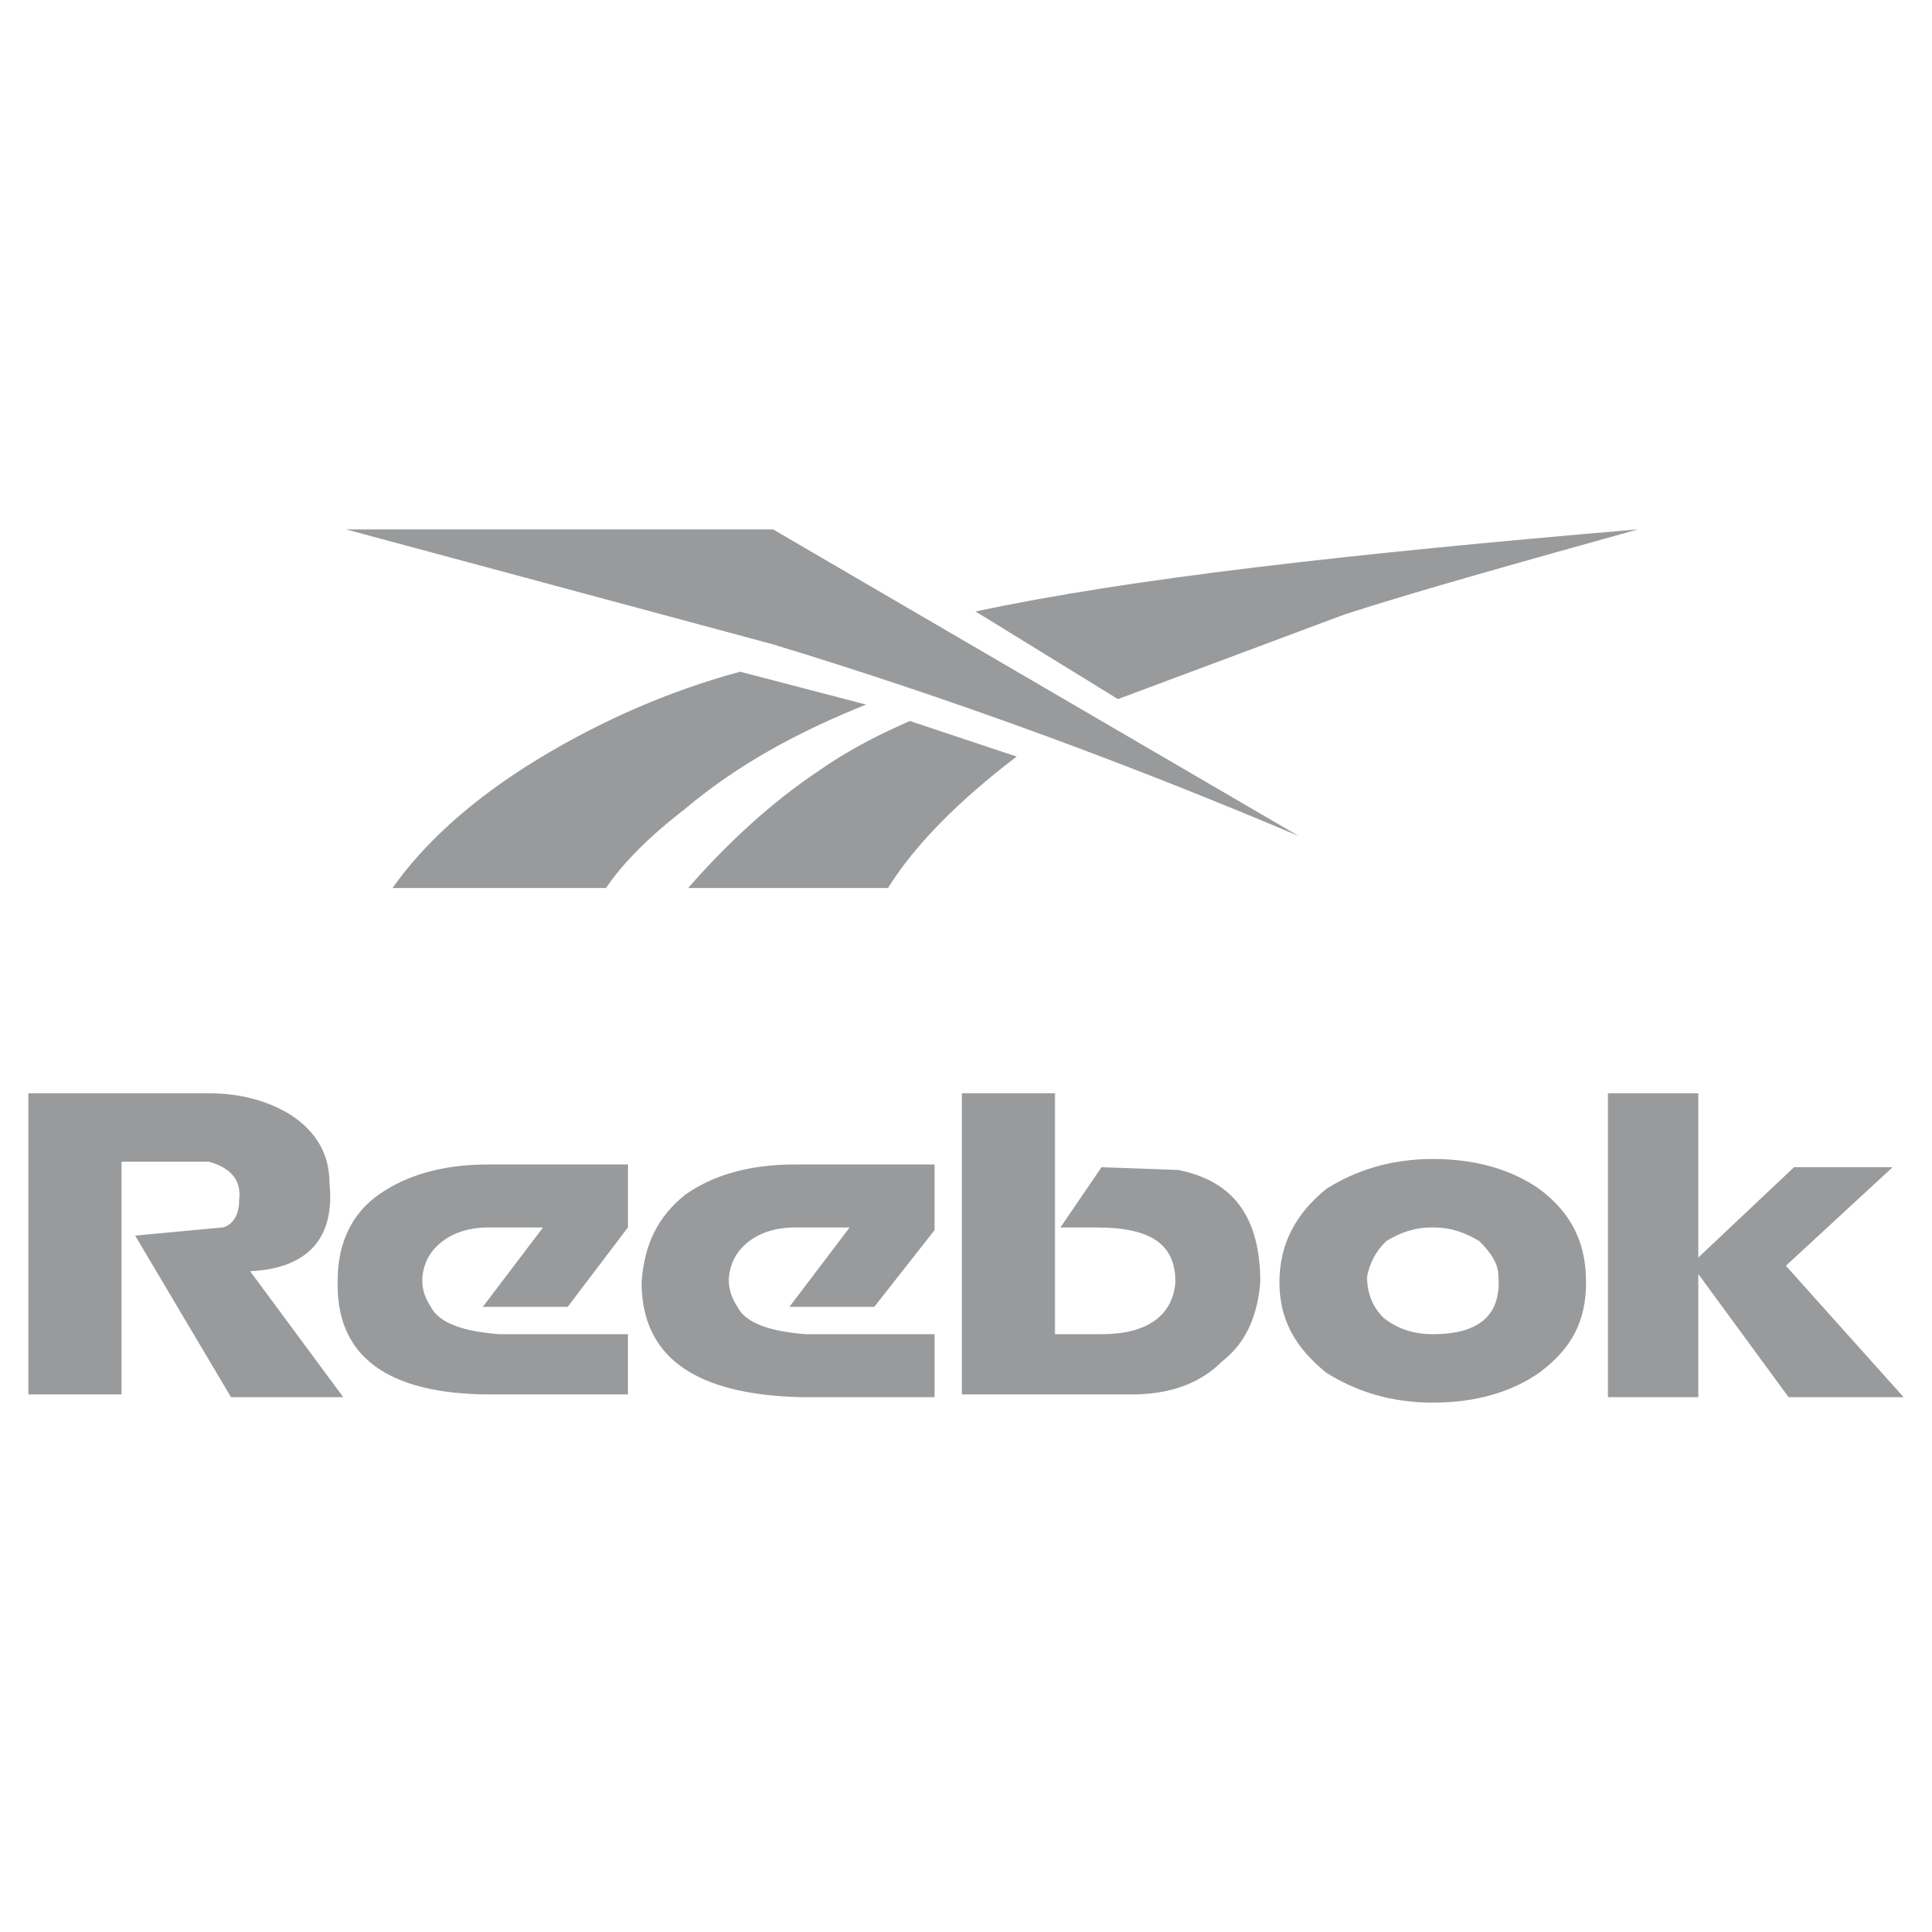 Reebok Logo Png Clipart - Ree